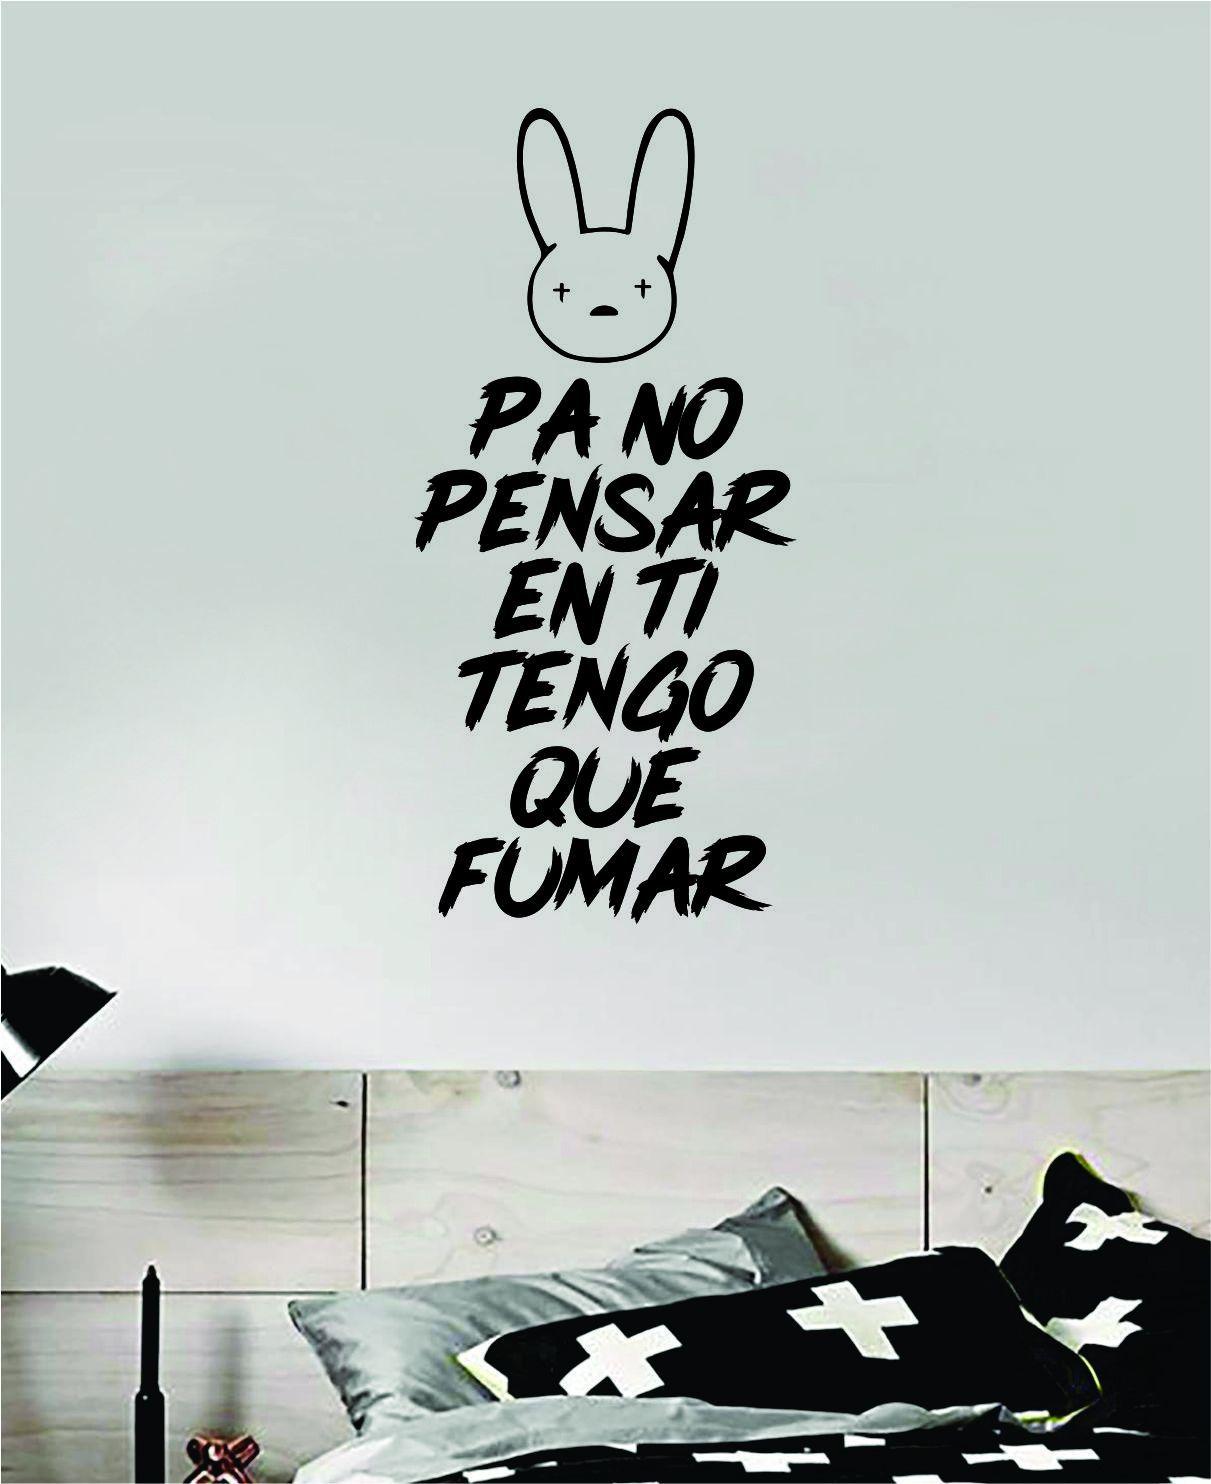 Bad Bunny Pa No Pensar En Ti Tengo Que Fumar YHLQMDLG Wall Decal Home Decor Sticker Vinyl Bedroom Room Quote Spanish Music Reggaeton Girls Funny Teen Lyrics - olympic blue